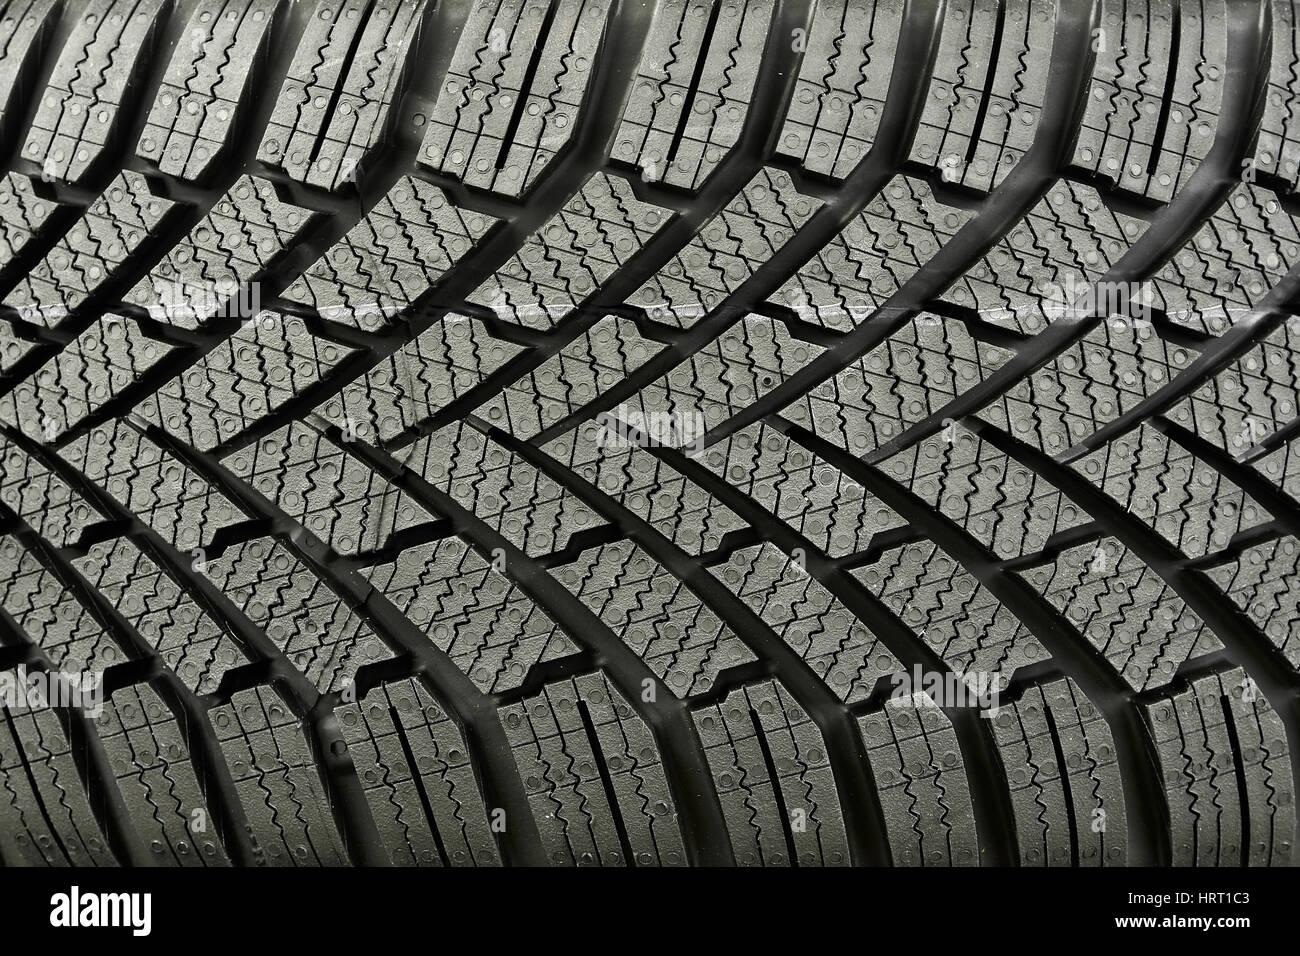 8k Car Wallpaper Download Car Tire Texture Stock Photo 135137635 Alamy